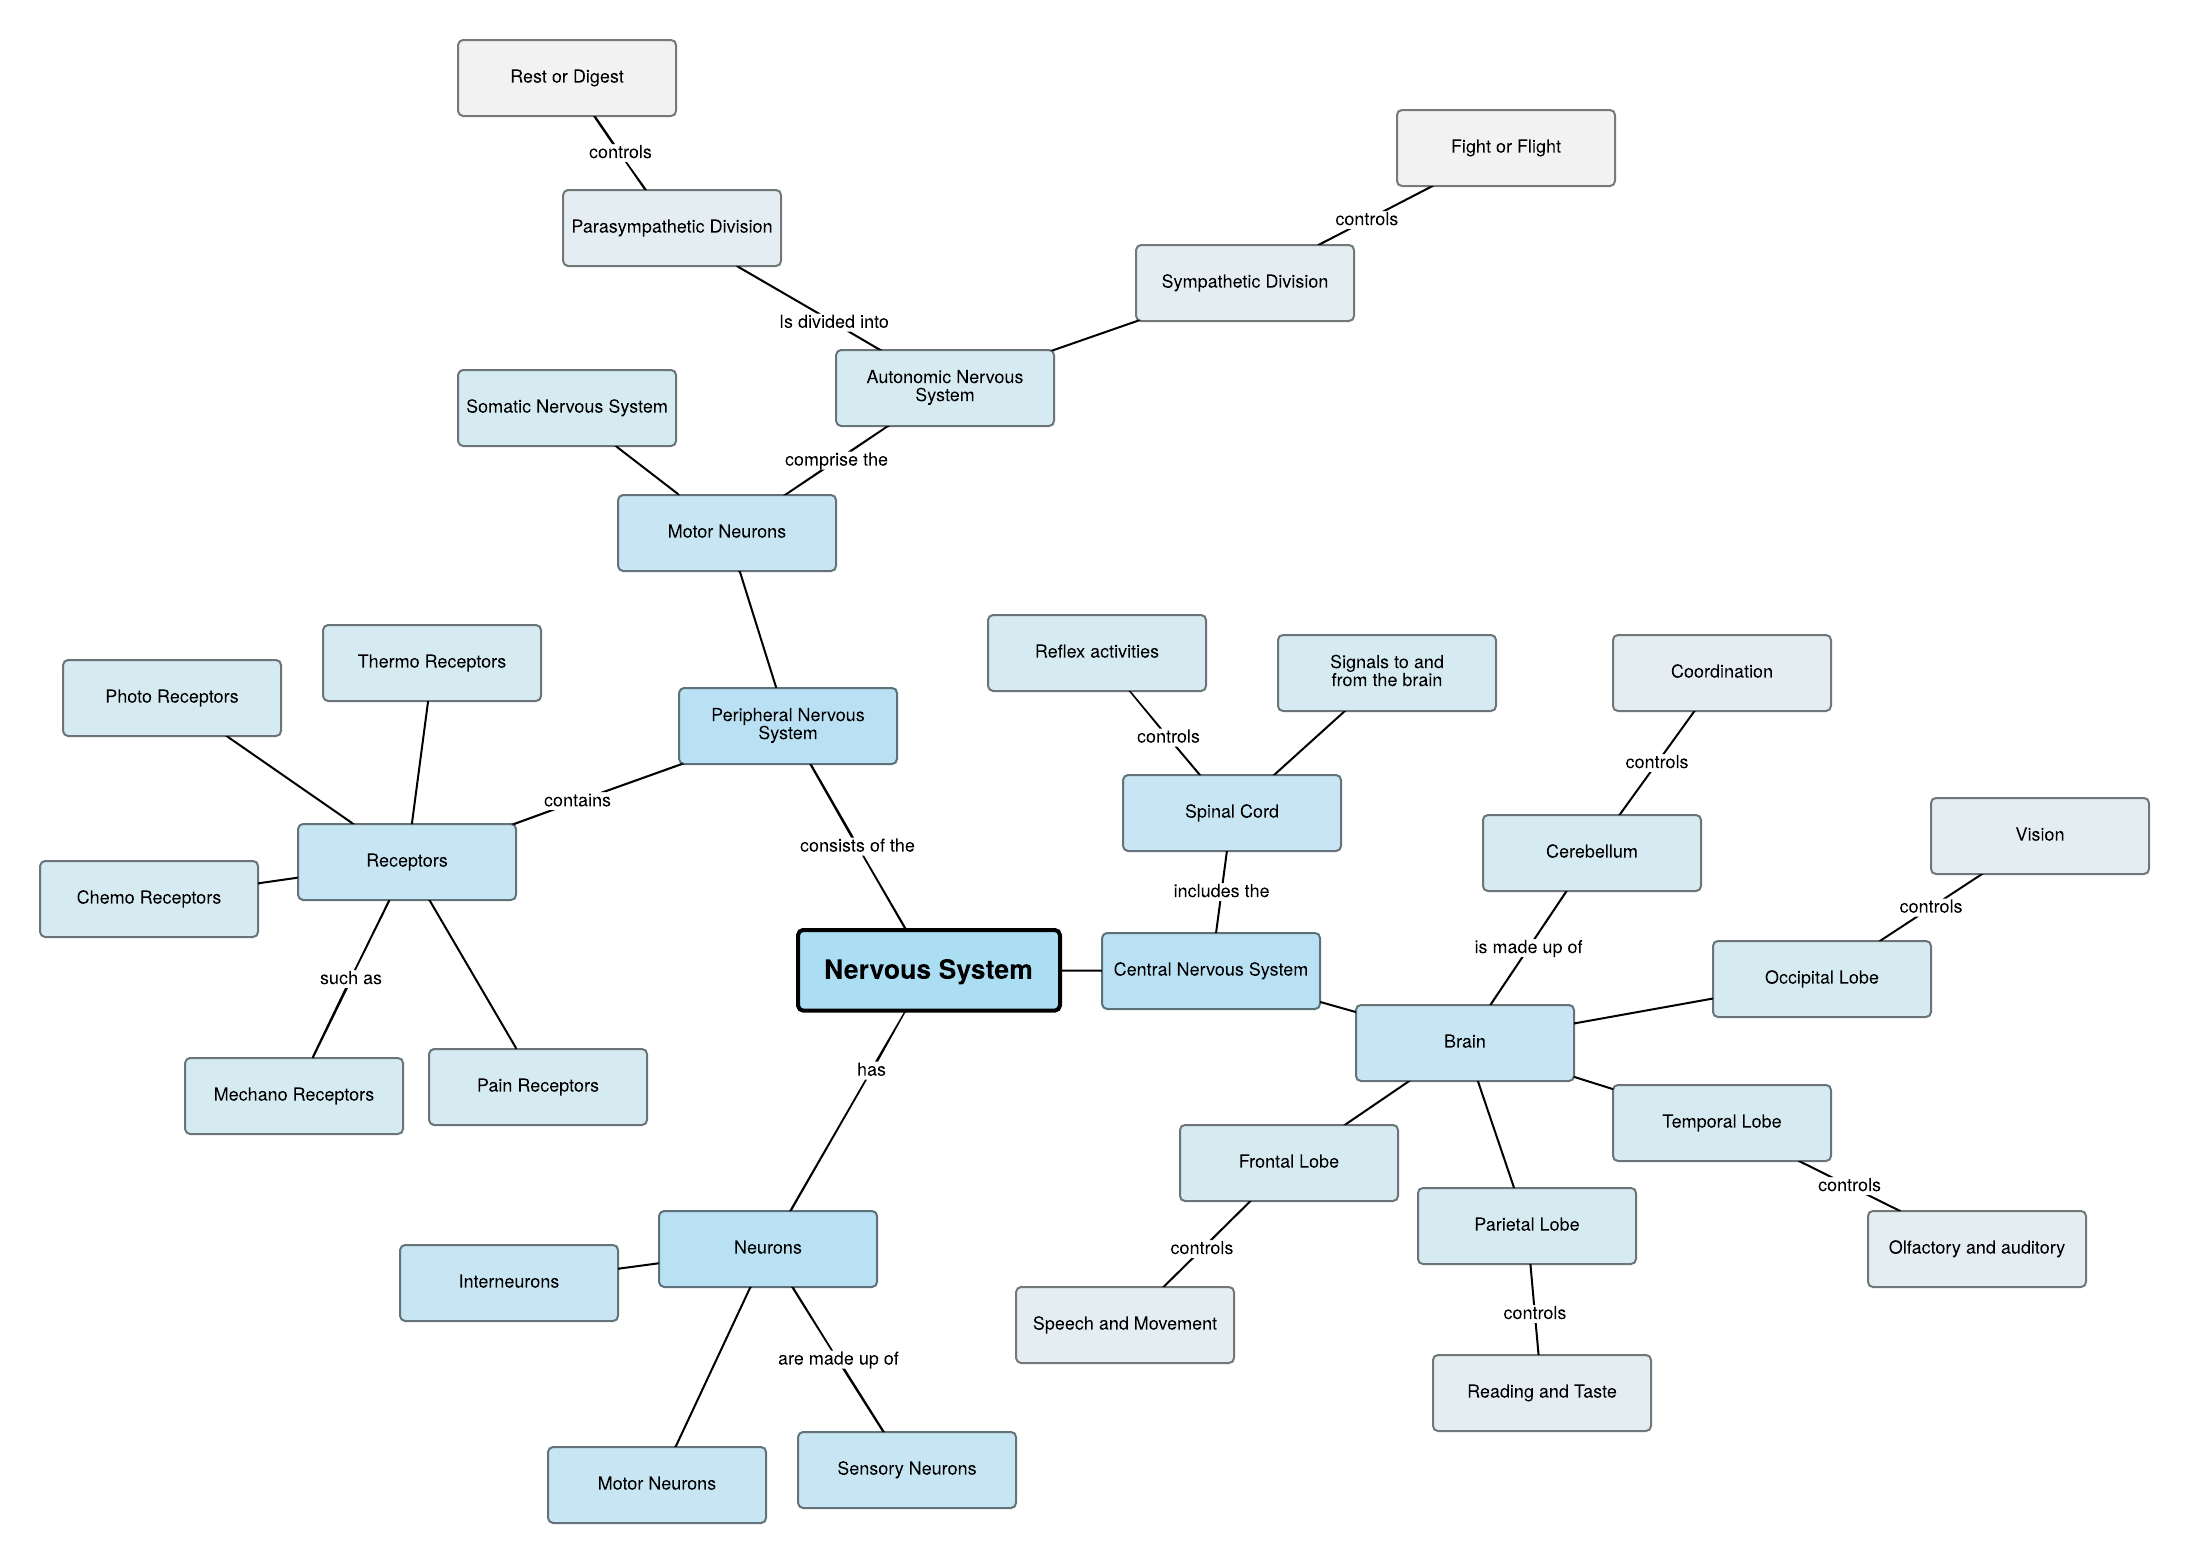 Mapa mental do sistema nervoso